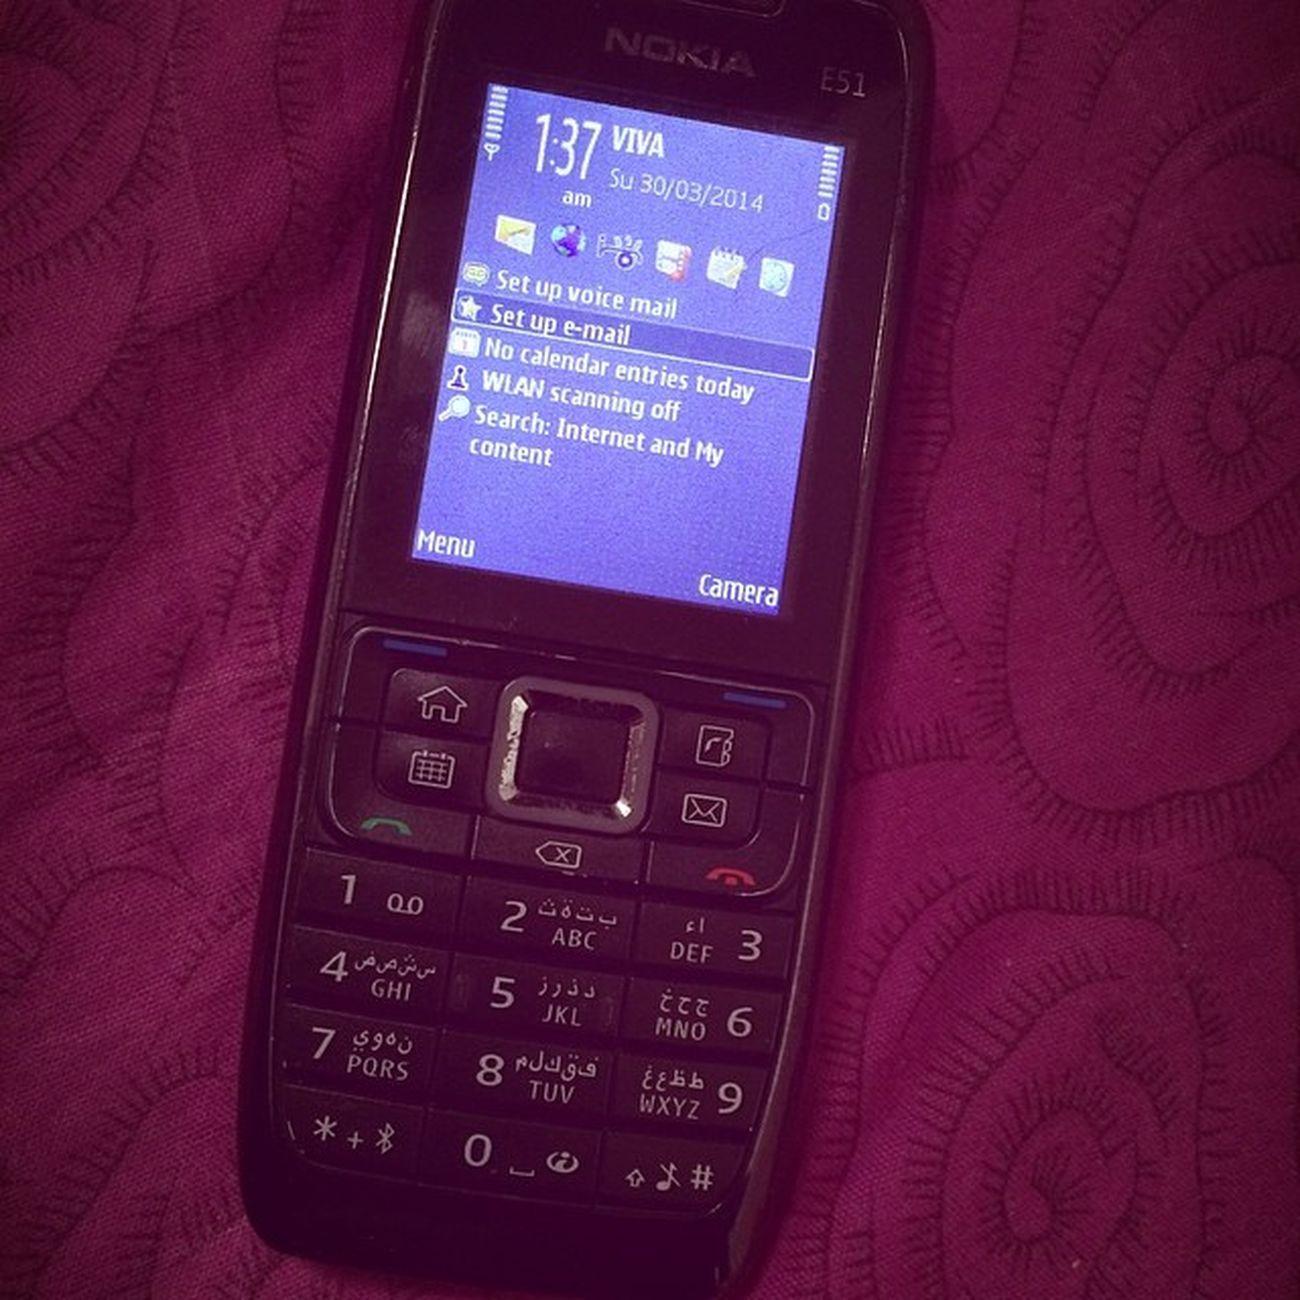 My Favorite Nokia  E51 Instalike Instagram instamomentinstapicinstahubinstadailyinstaaddictinstapicofthedayinstafollowinstafamousinstaloveinstaphotographyphotographyiphoneipadminisamsunginstakuwaitq8q8instagramindiamangalorebangaloredubailebanesegermanyistanbulworld